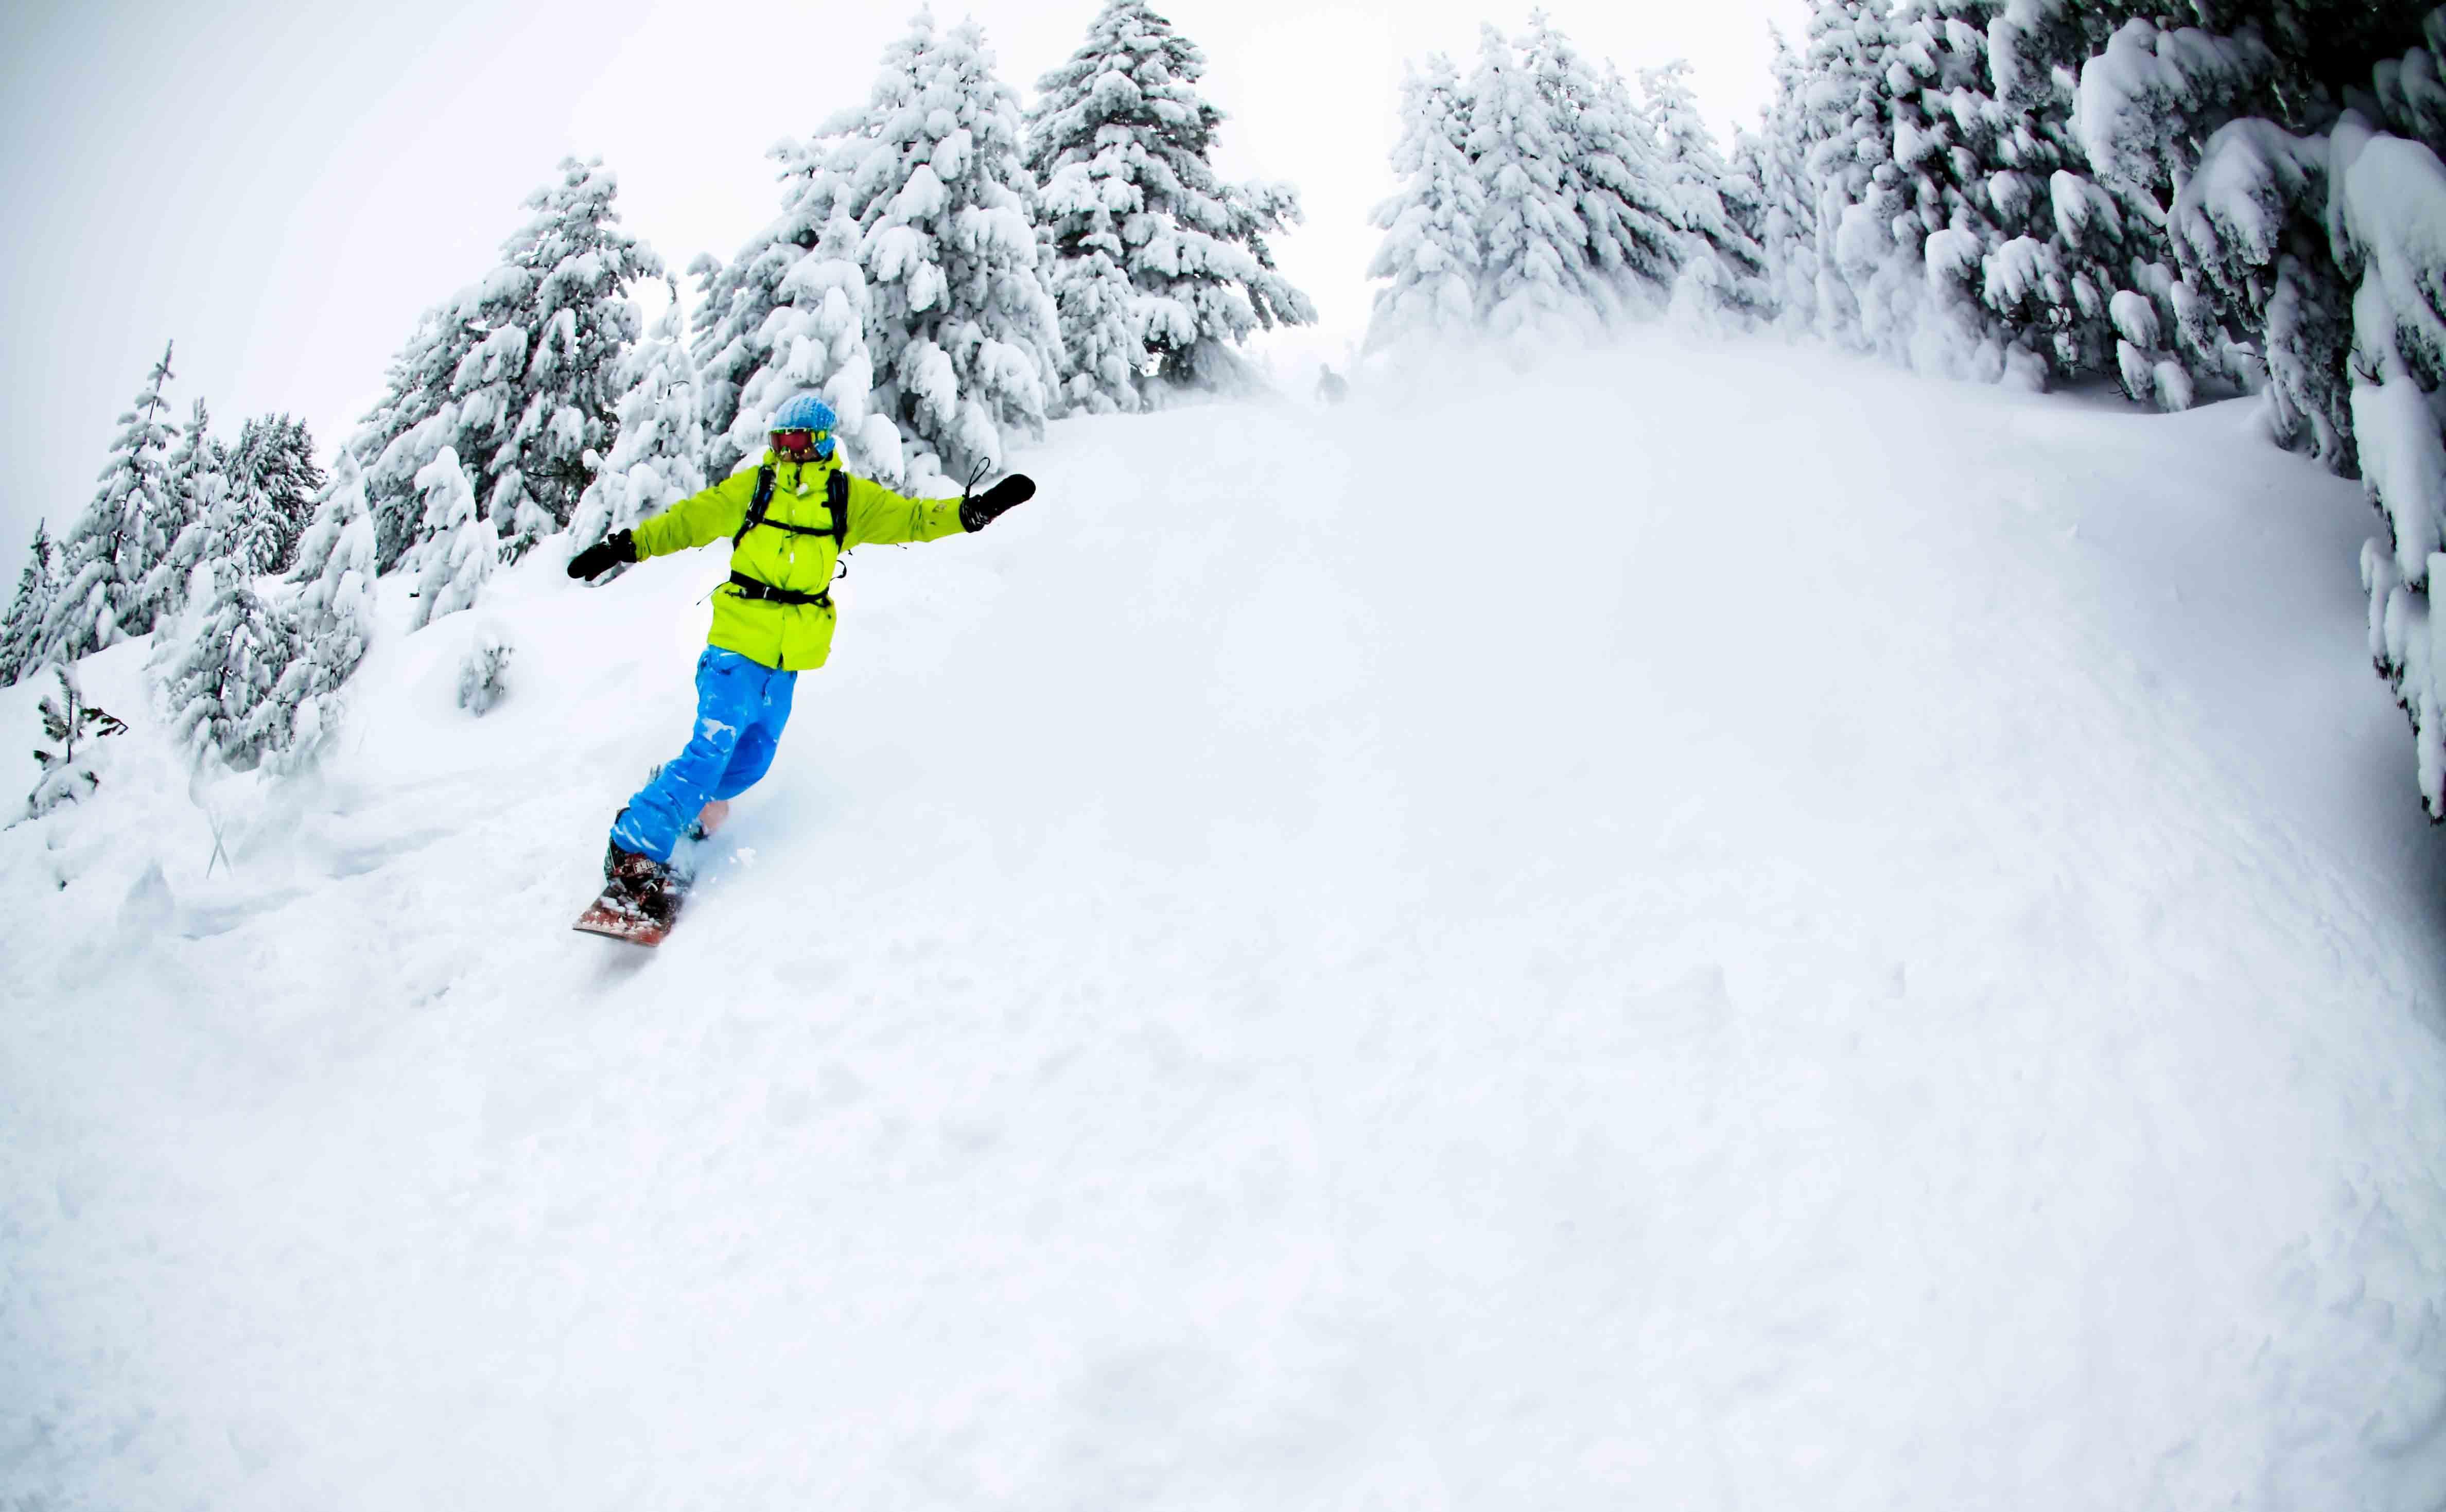 Snowboarding Hd Background